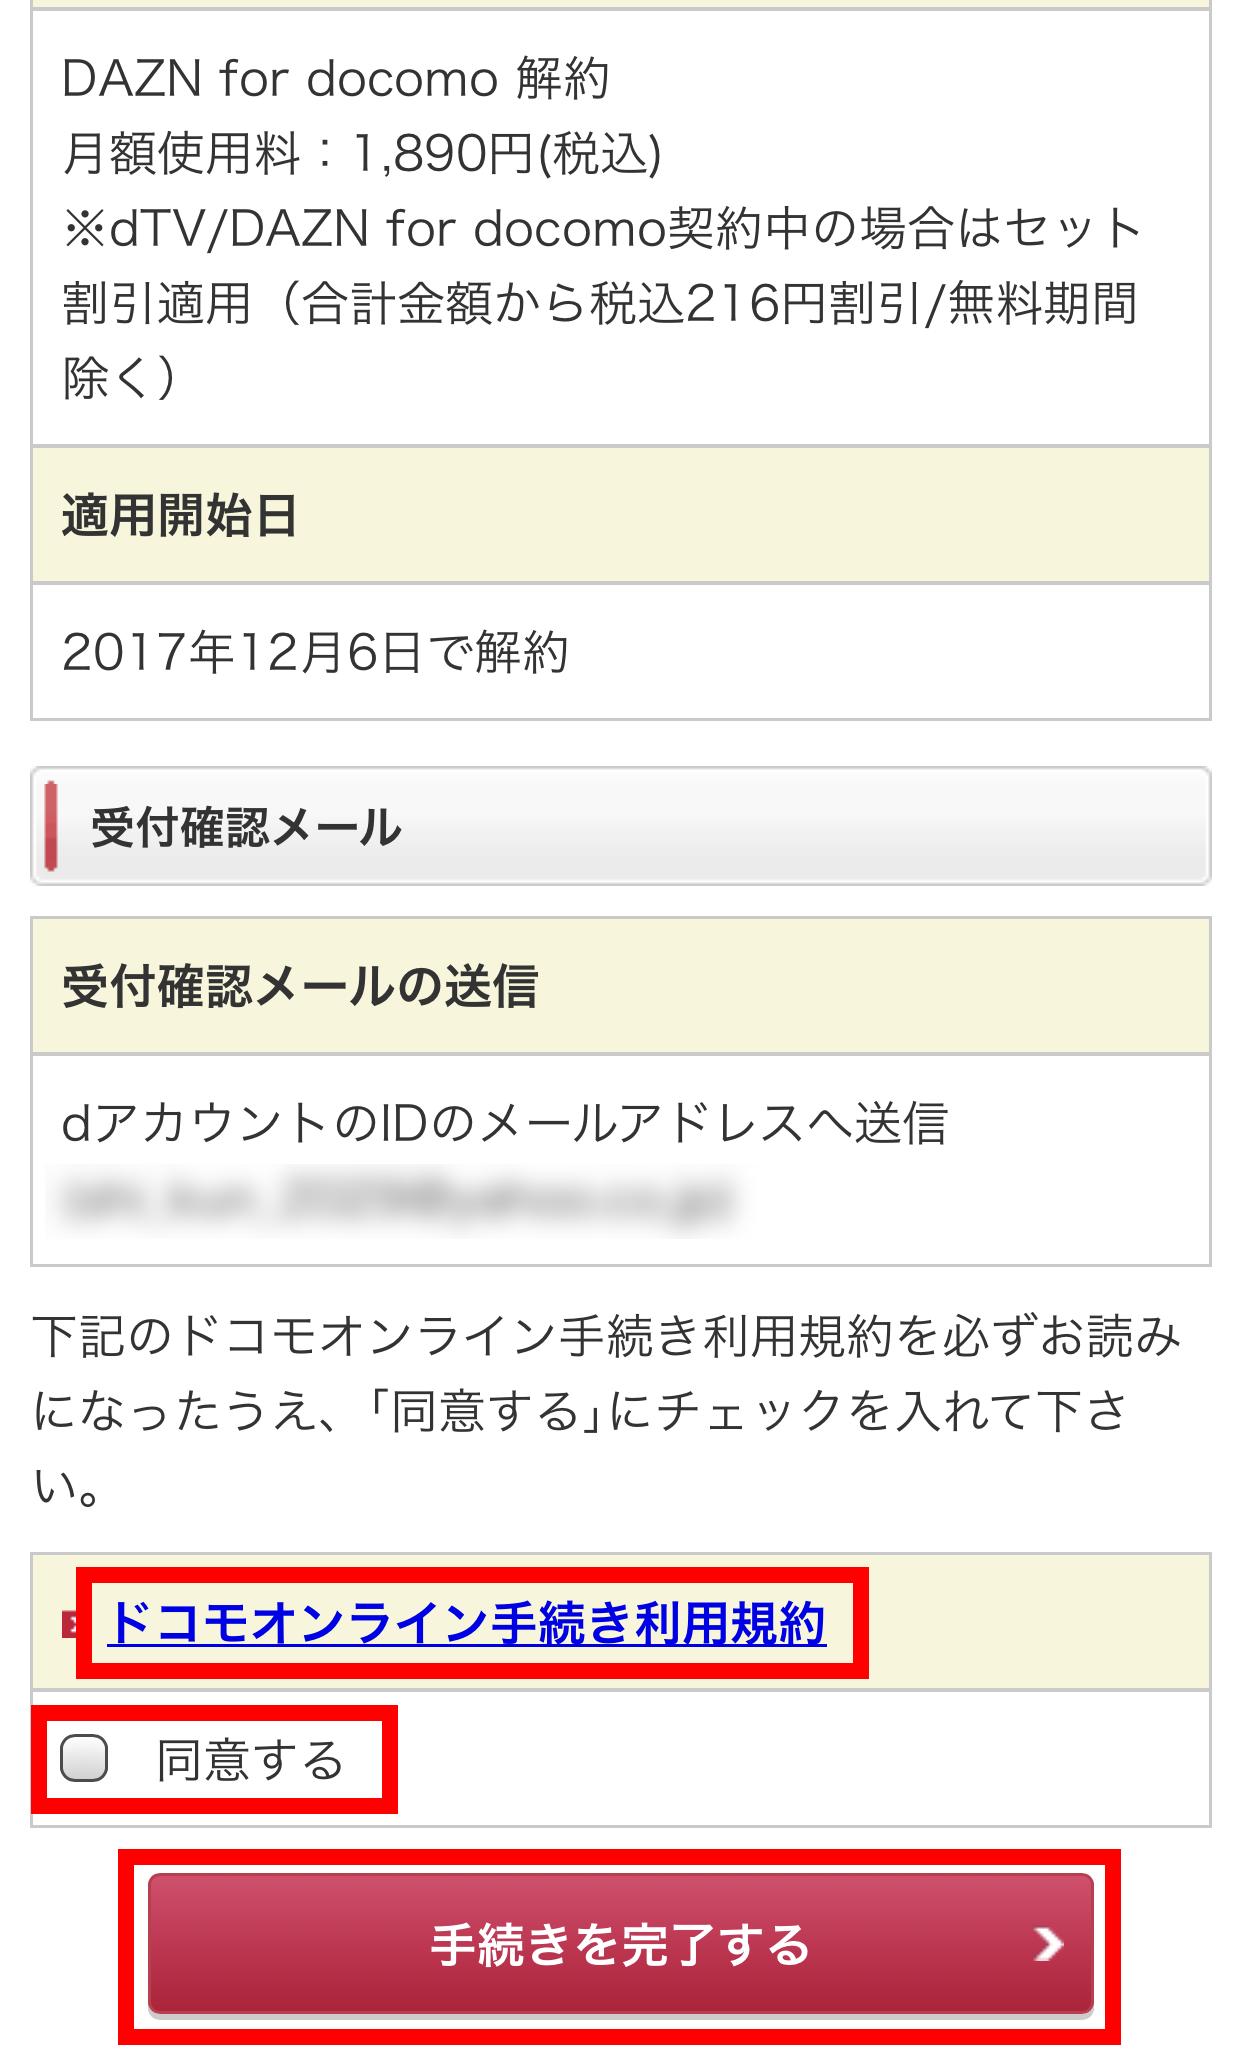 DAZN for docomo解約手続き完了